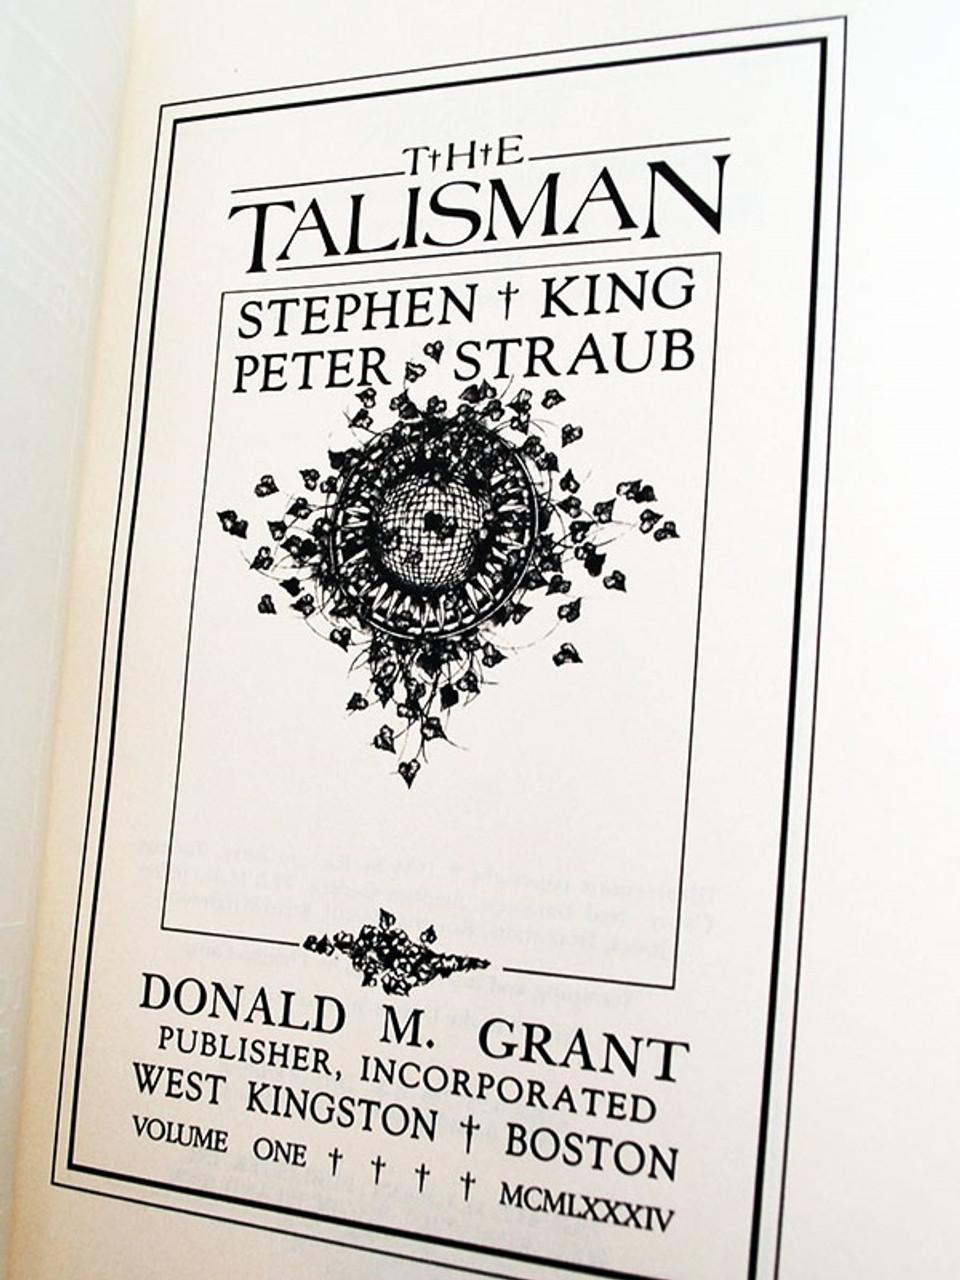 Stephen King Talisman Signed Limited